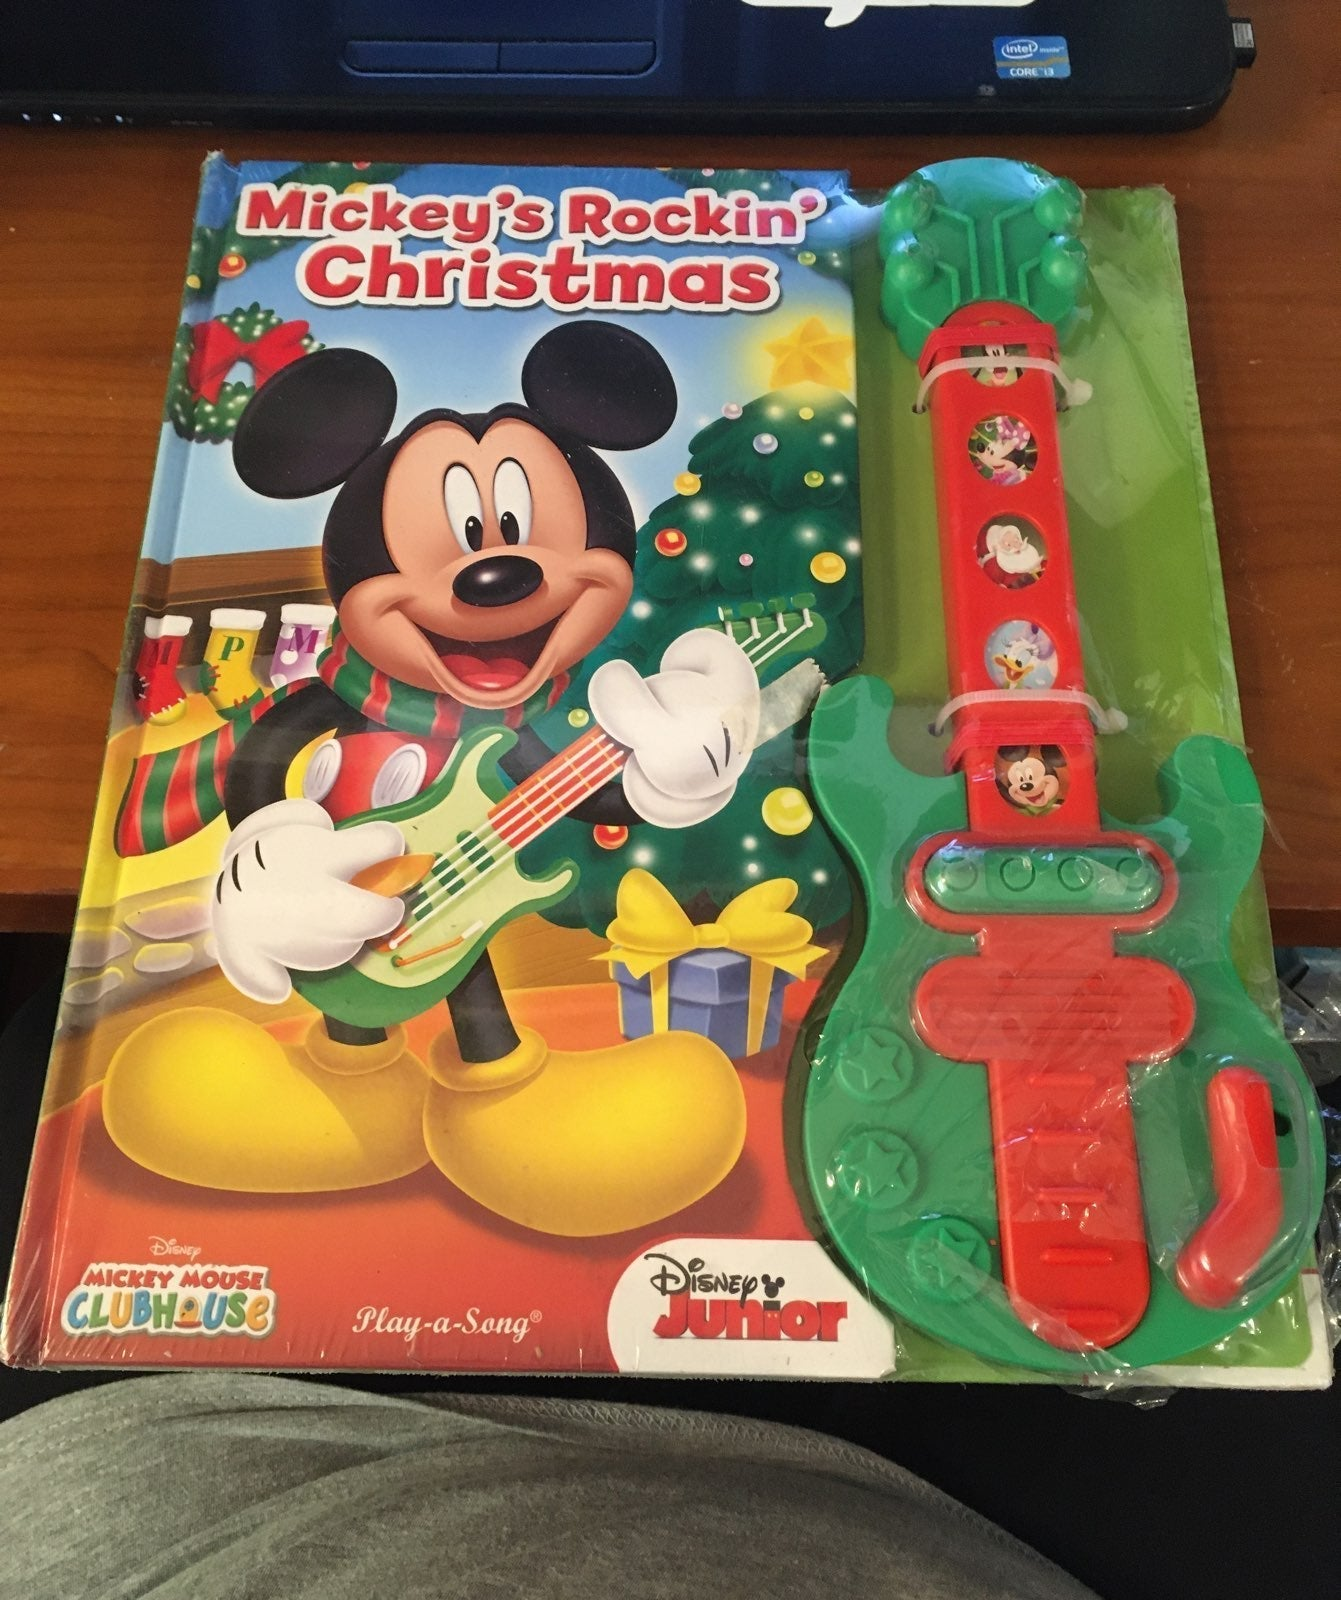 Mickeys Rockin Christmas